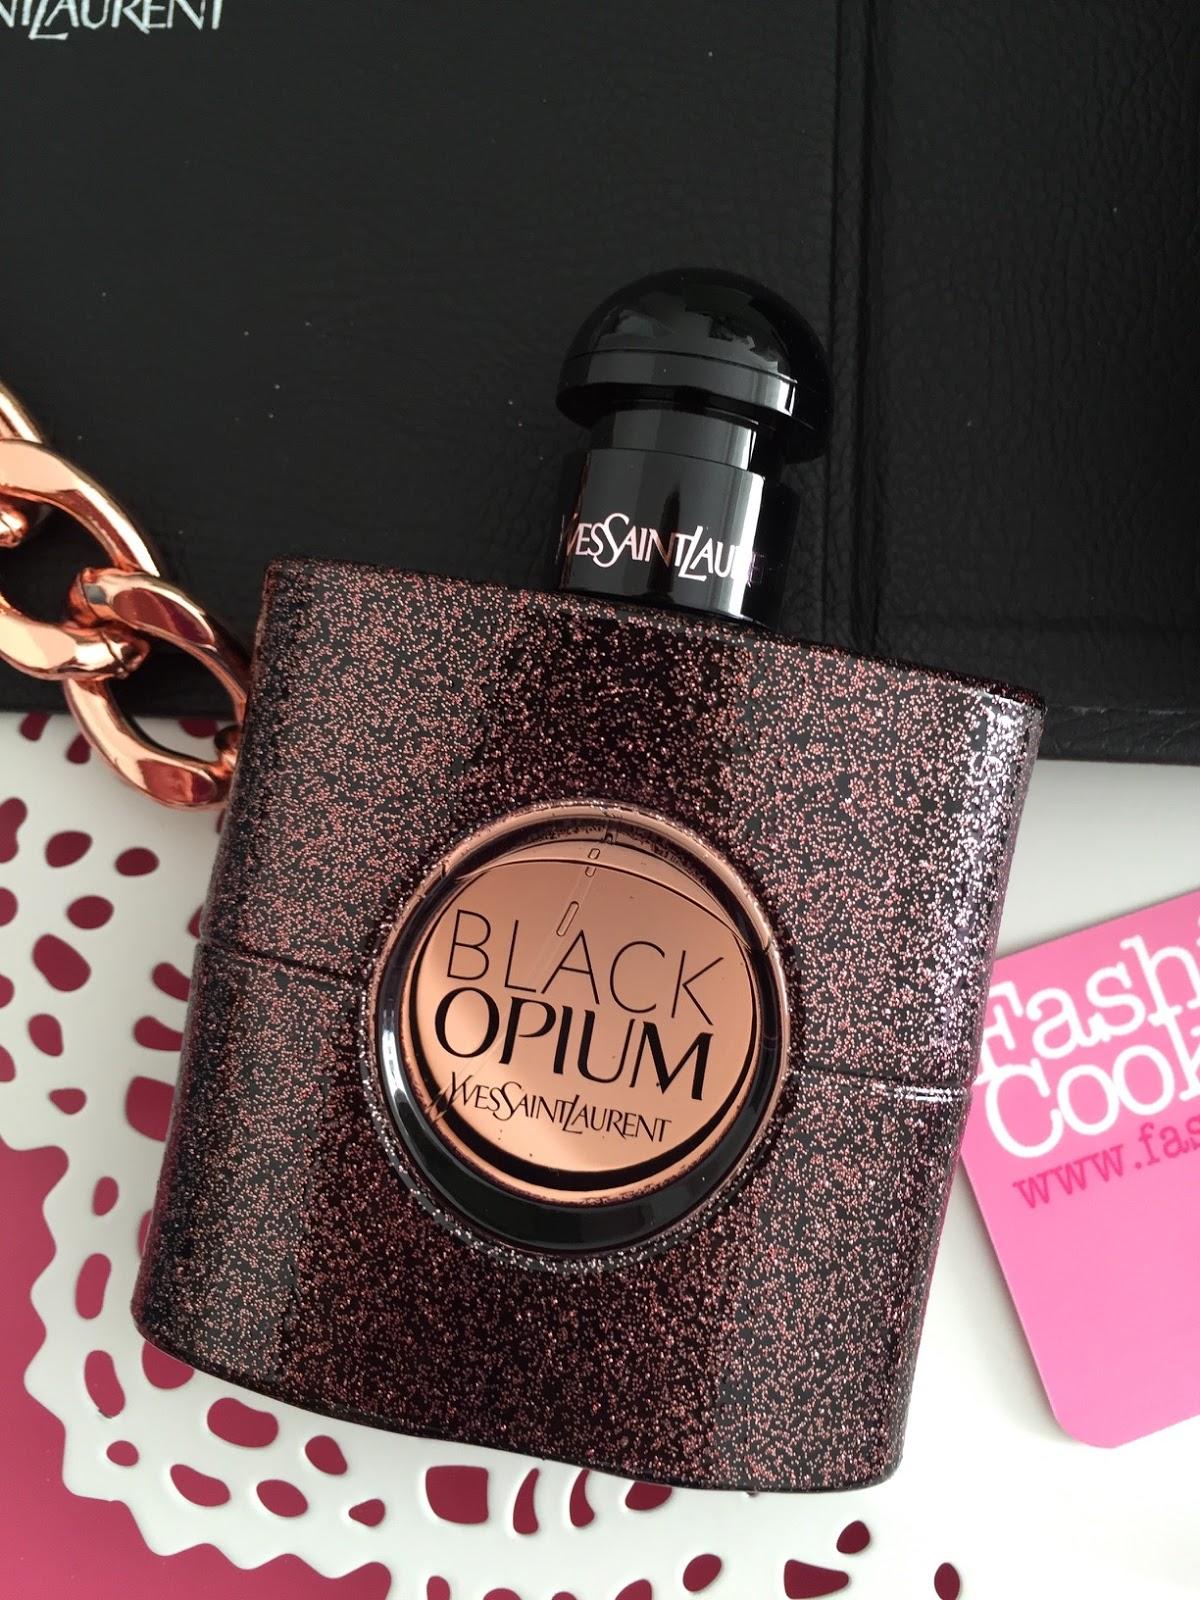 YSL Black Opium Eau de Toilette on Fashion and Cookies fashion and beauty blog